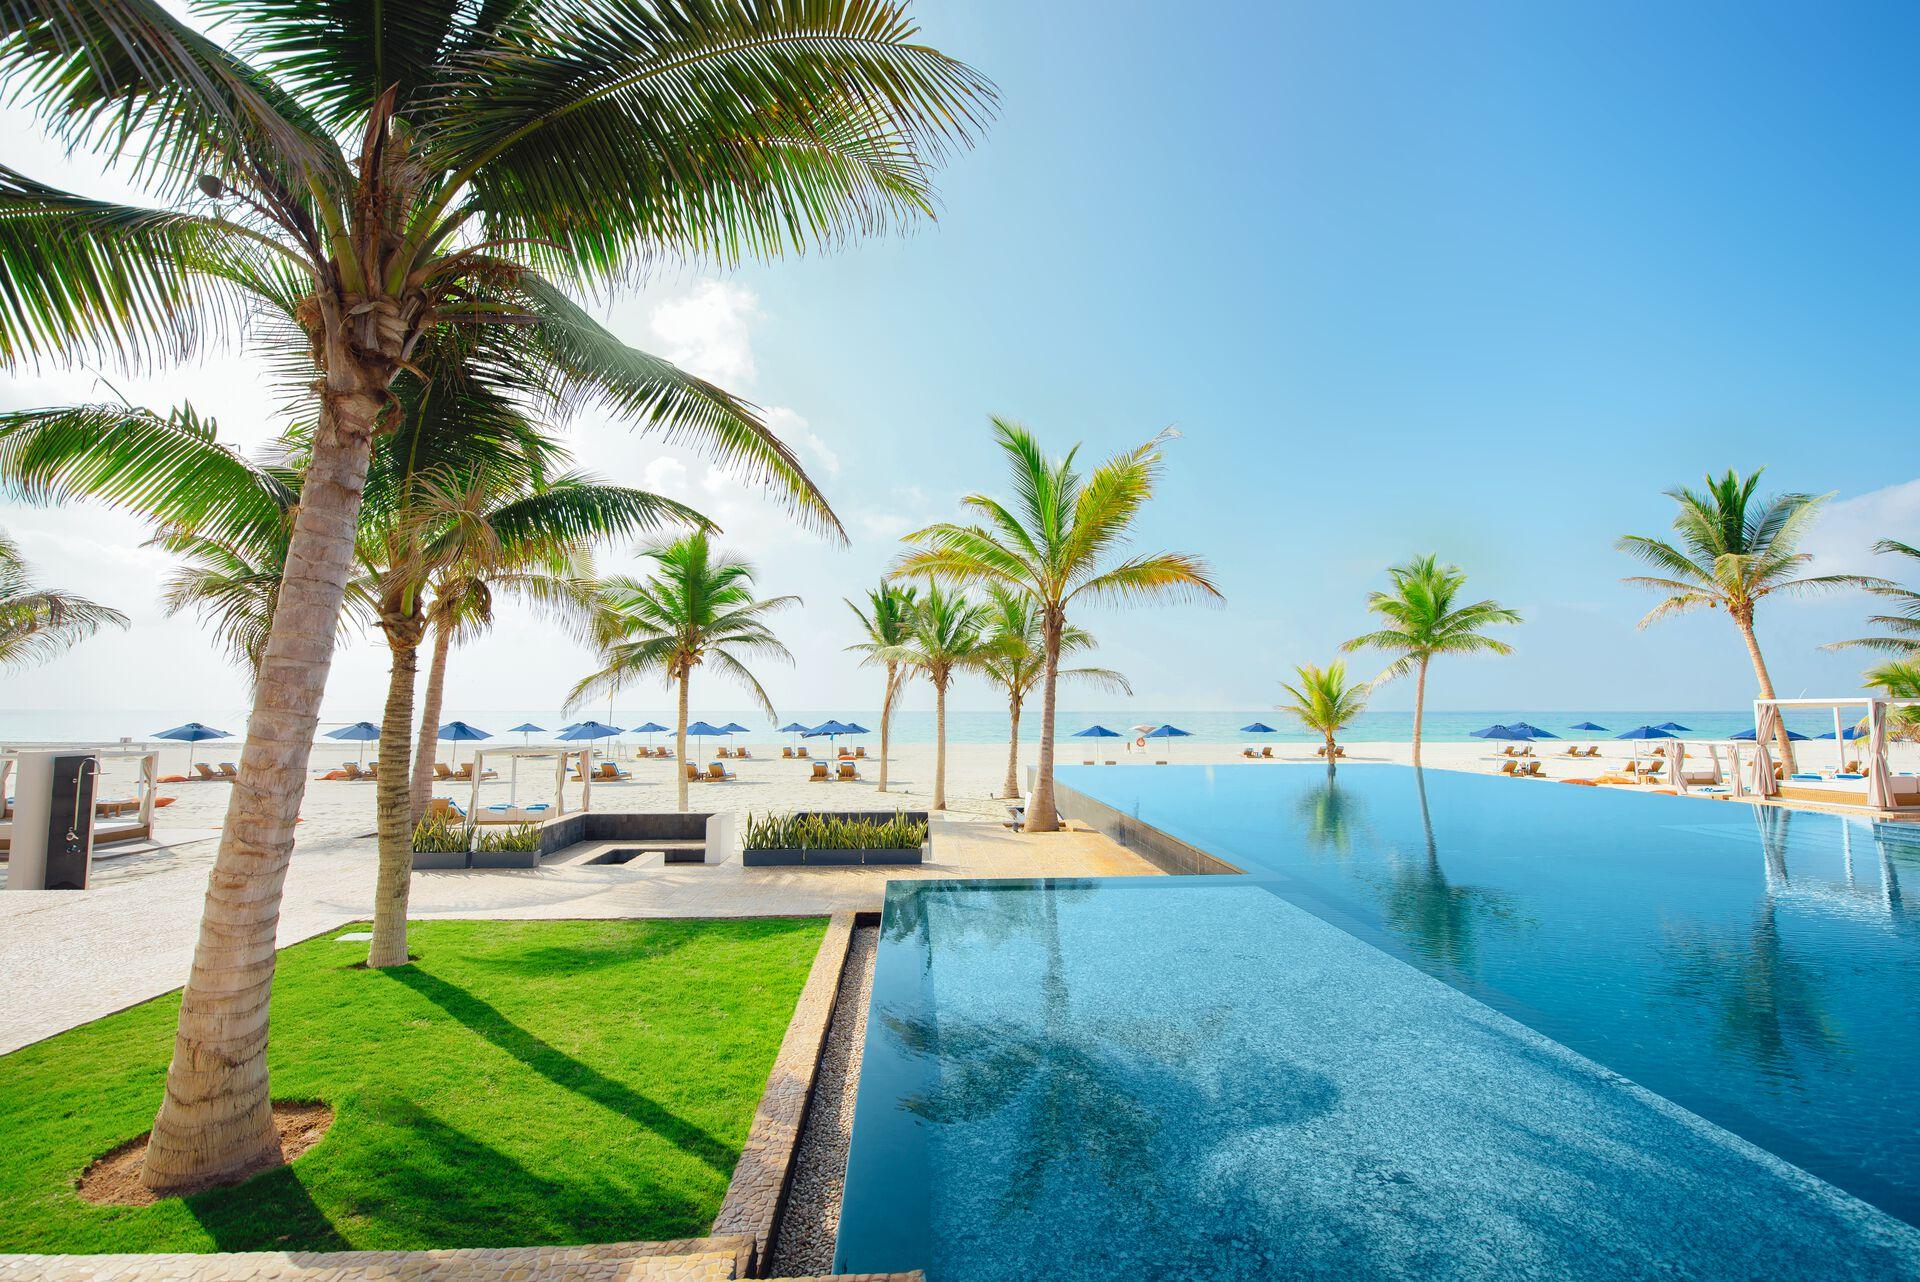 Al Baleed Resort Salalah by Anantara - 5*